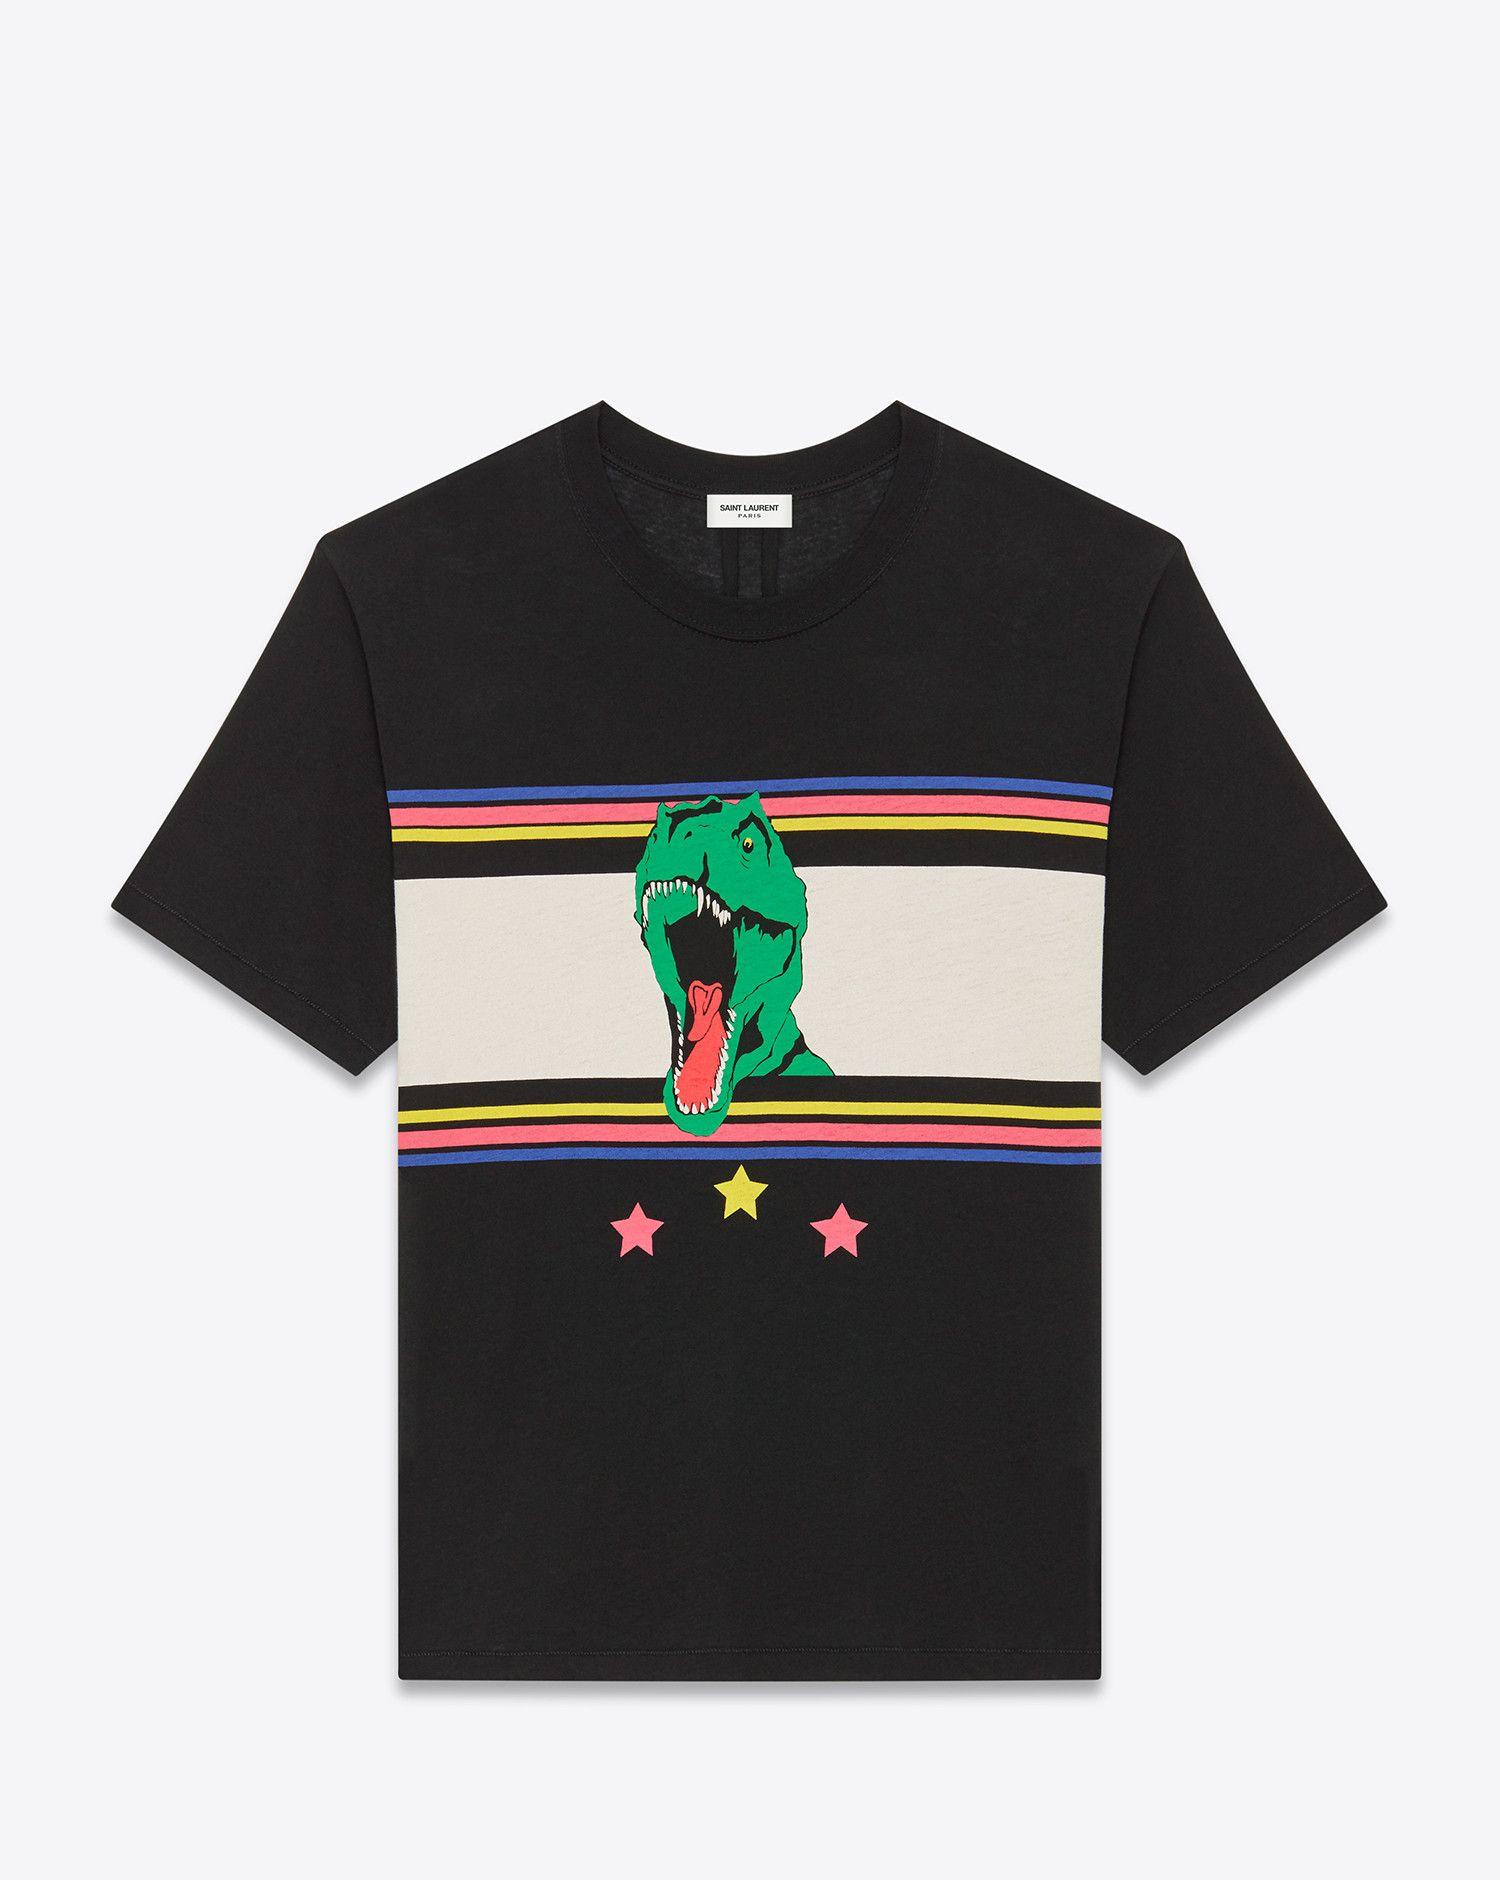 3D Printed T-Shirts Vintage Urban Tyrannosaurus Head Short Sleeve Tops Tees